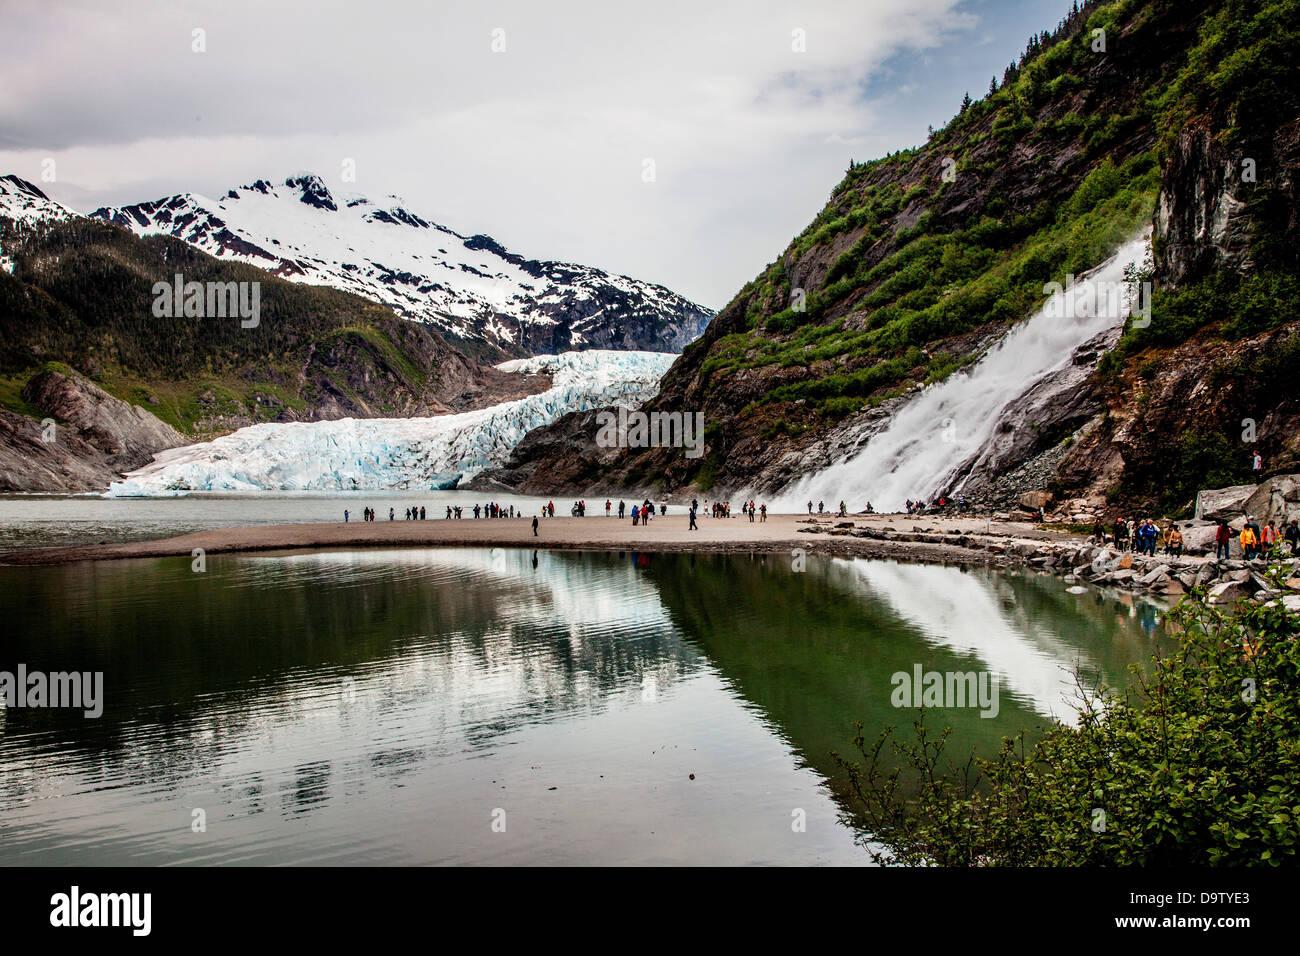 USA, Alaska, Juneau, Gold Creek Falls at Mendenhall Glacier - Stock Image